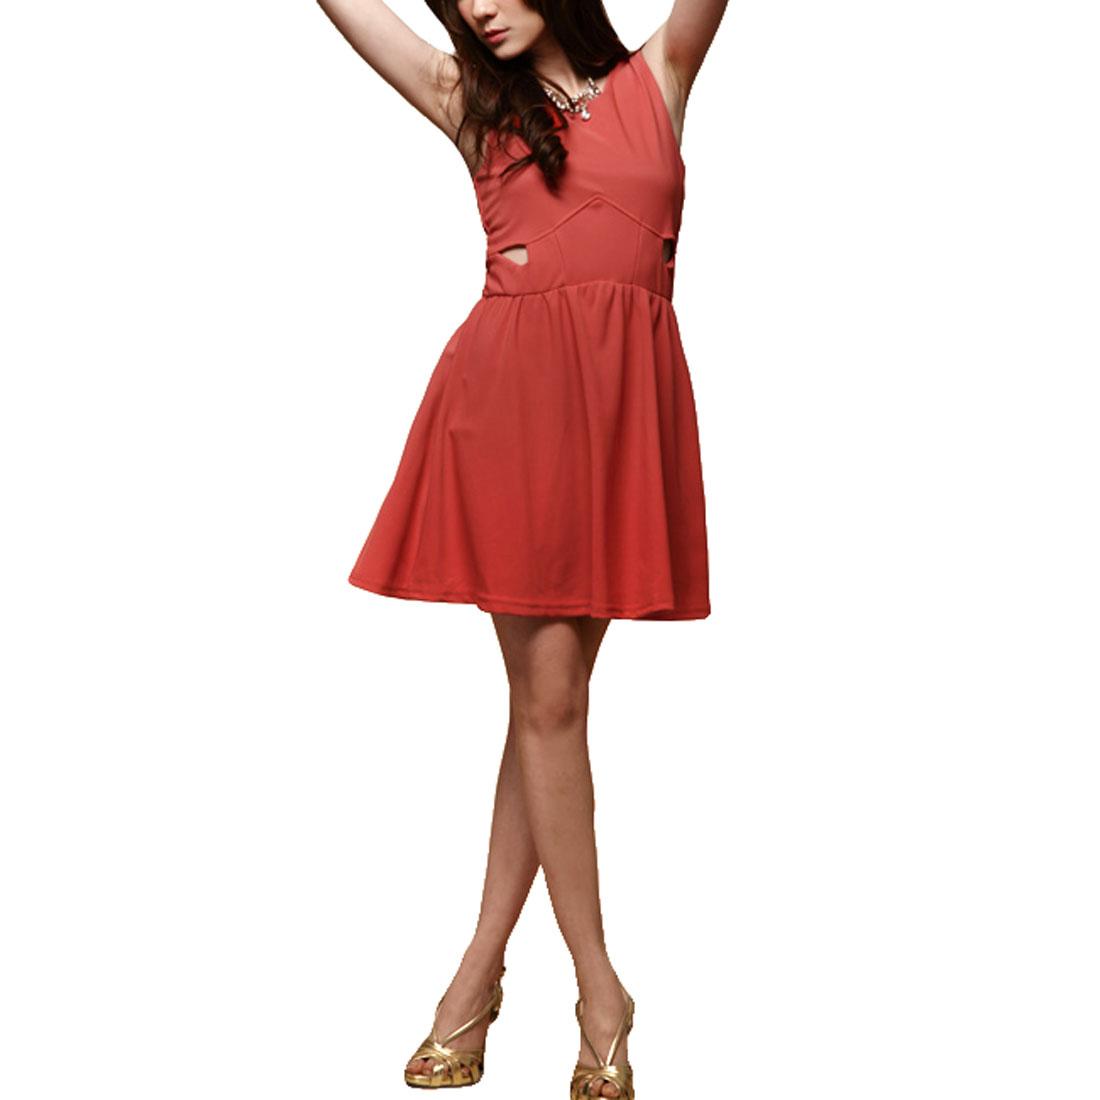 Ladies Sleeveless Low Round Neck Mini Tank Dress Orange Red XS